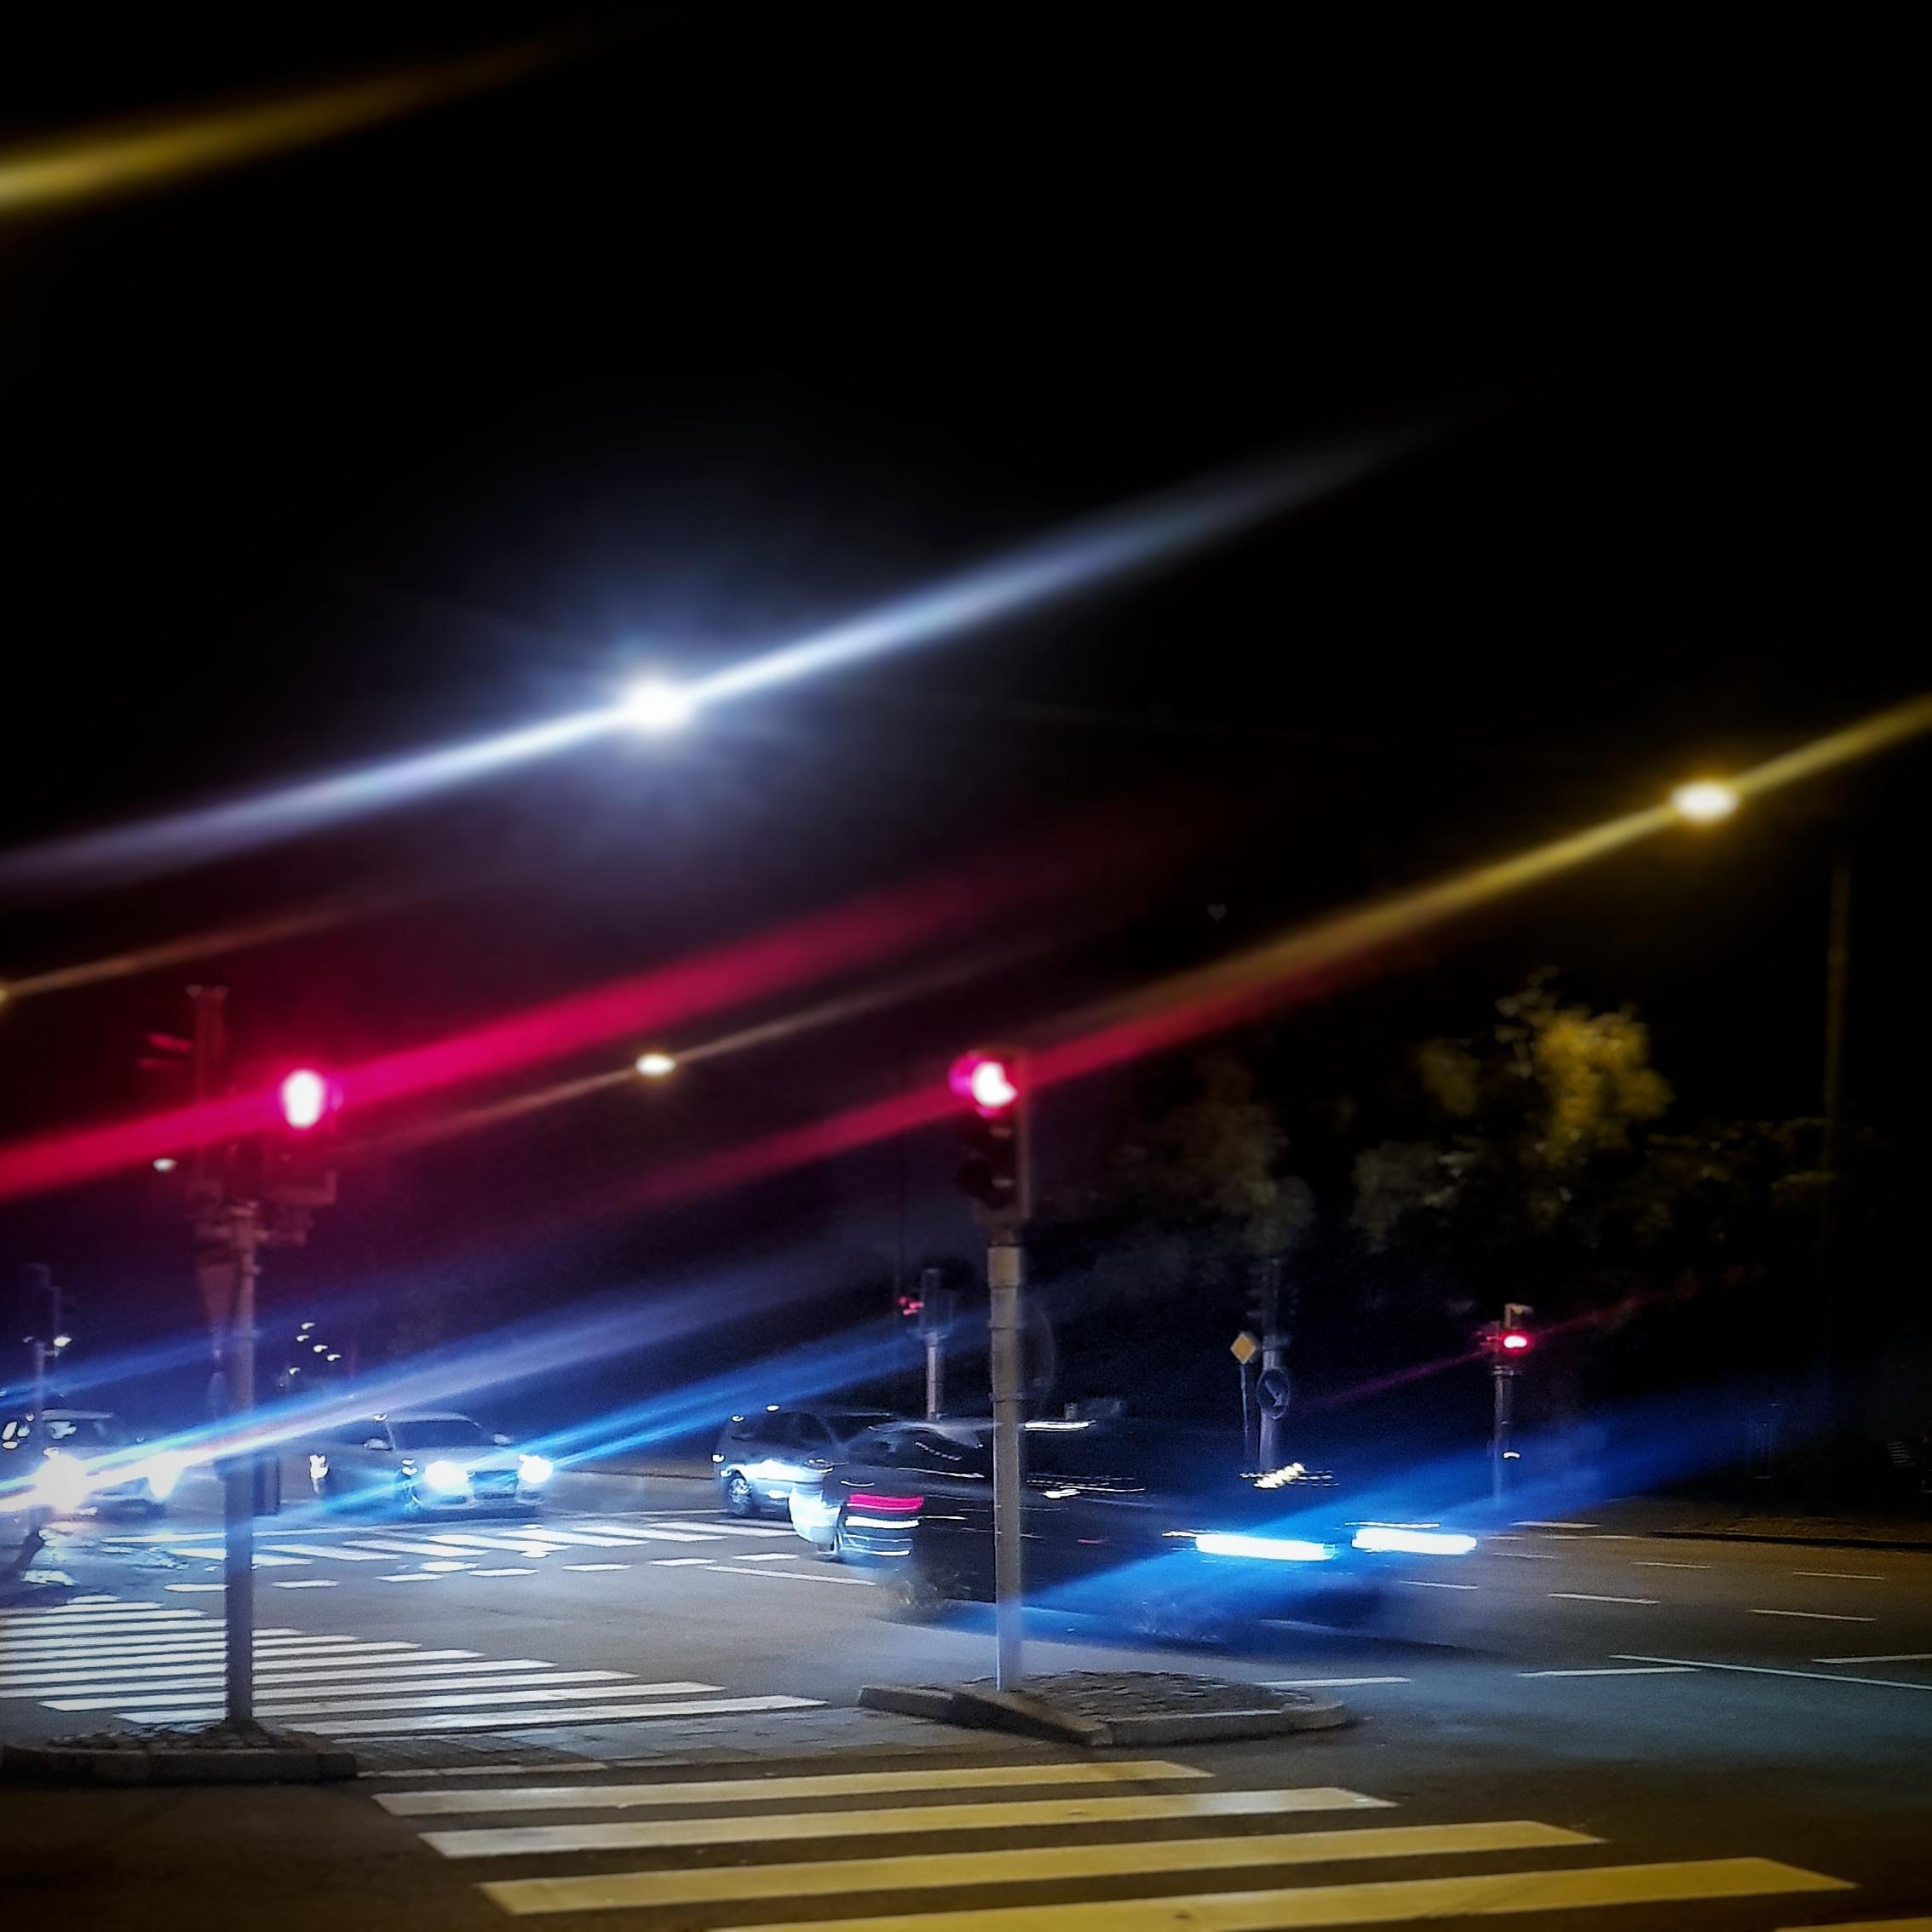 Day 306 - November 2: Night Traffic